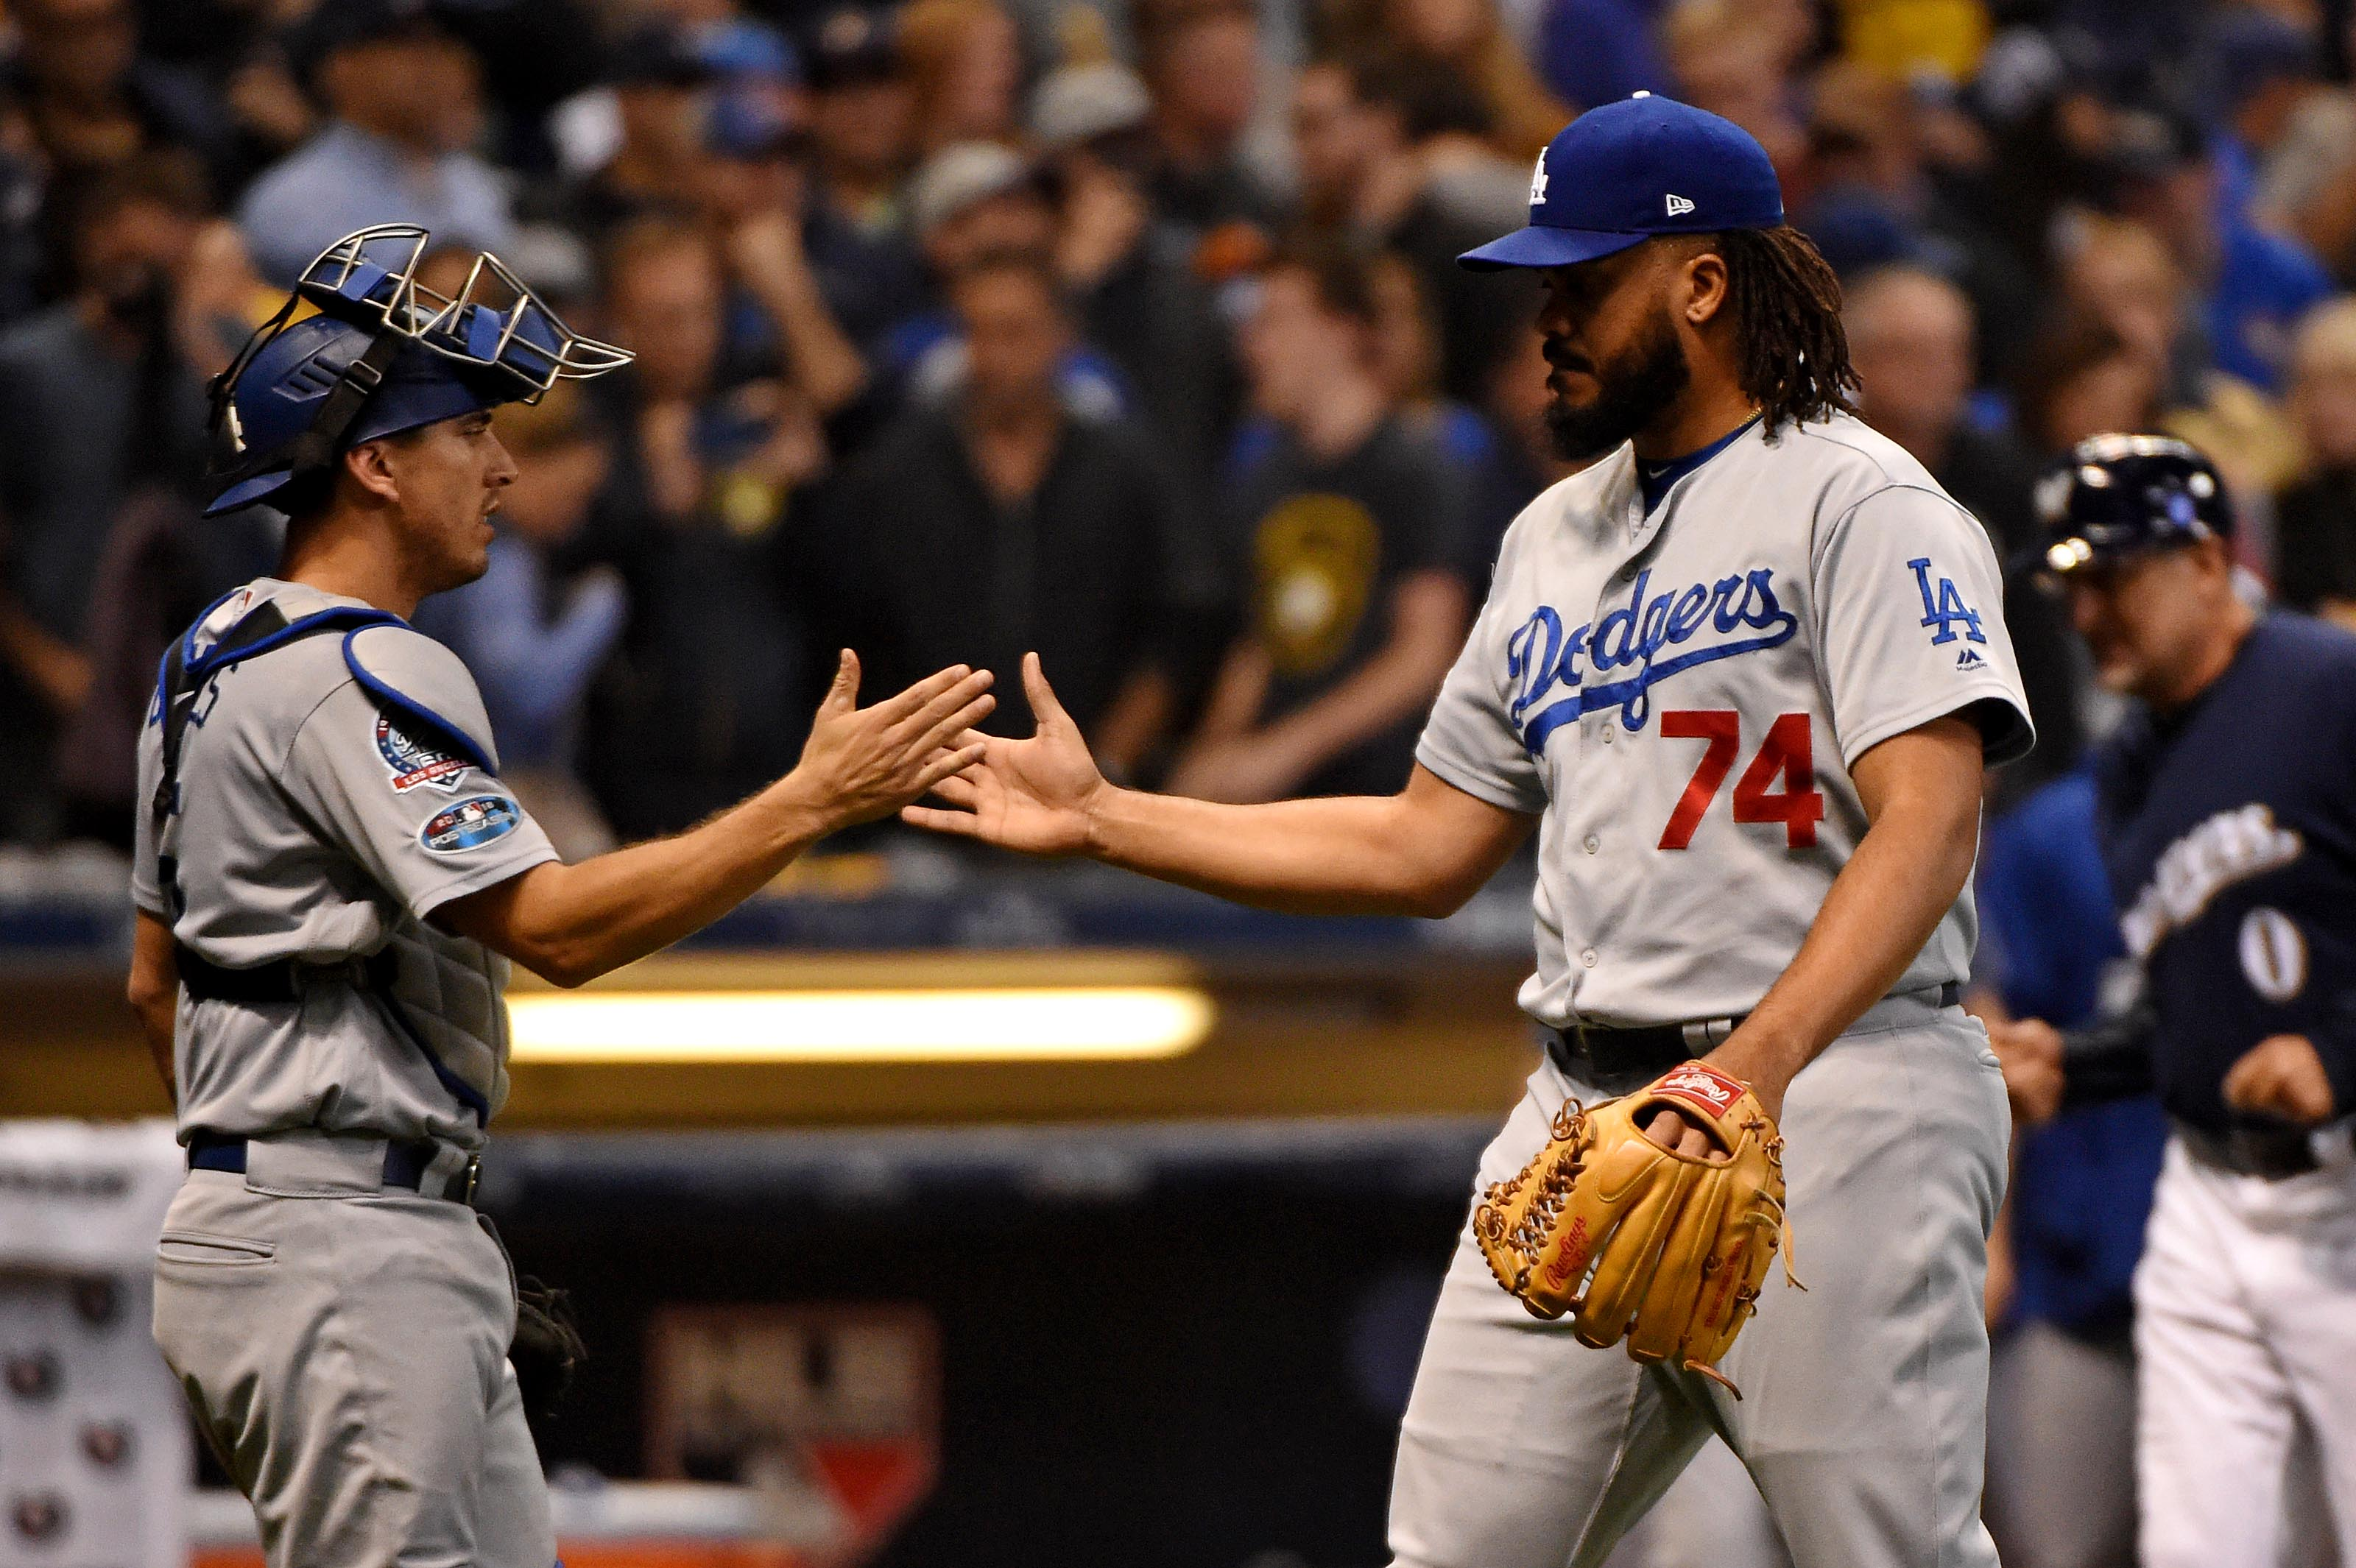 Dodgers fans get their wish: backup catcher Austin Barnes to start Game 4